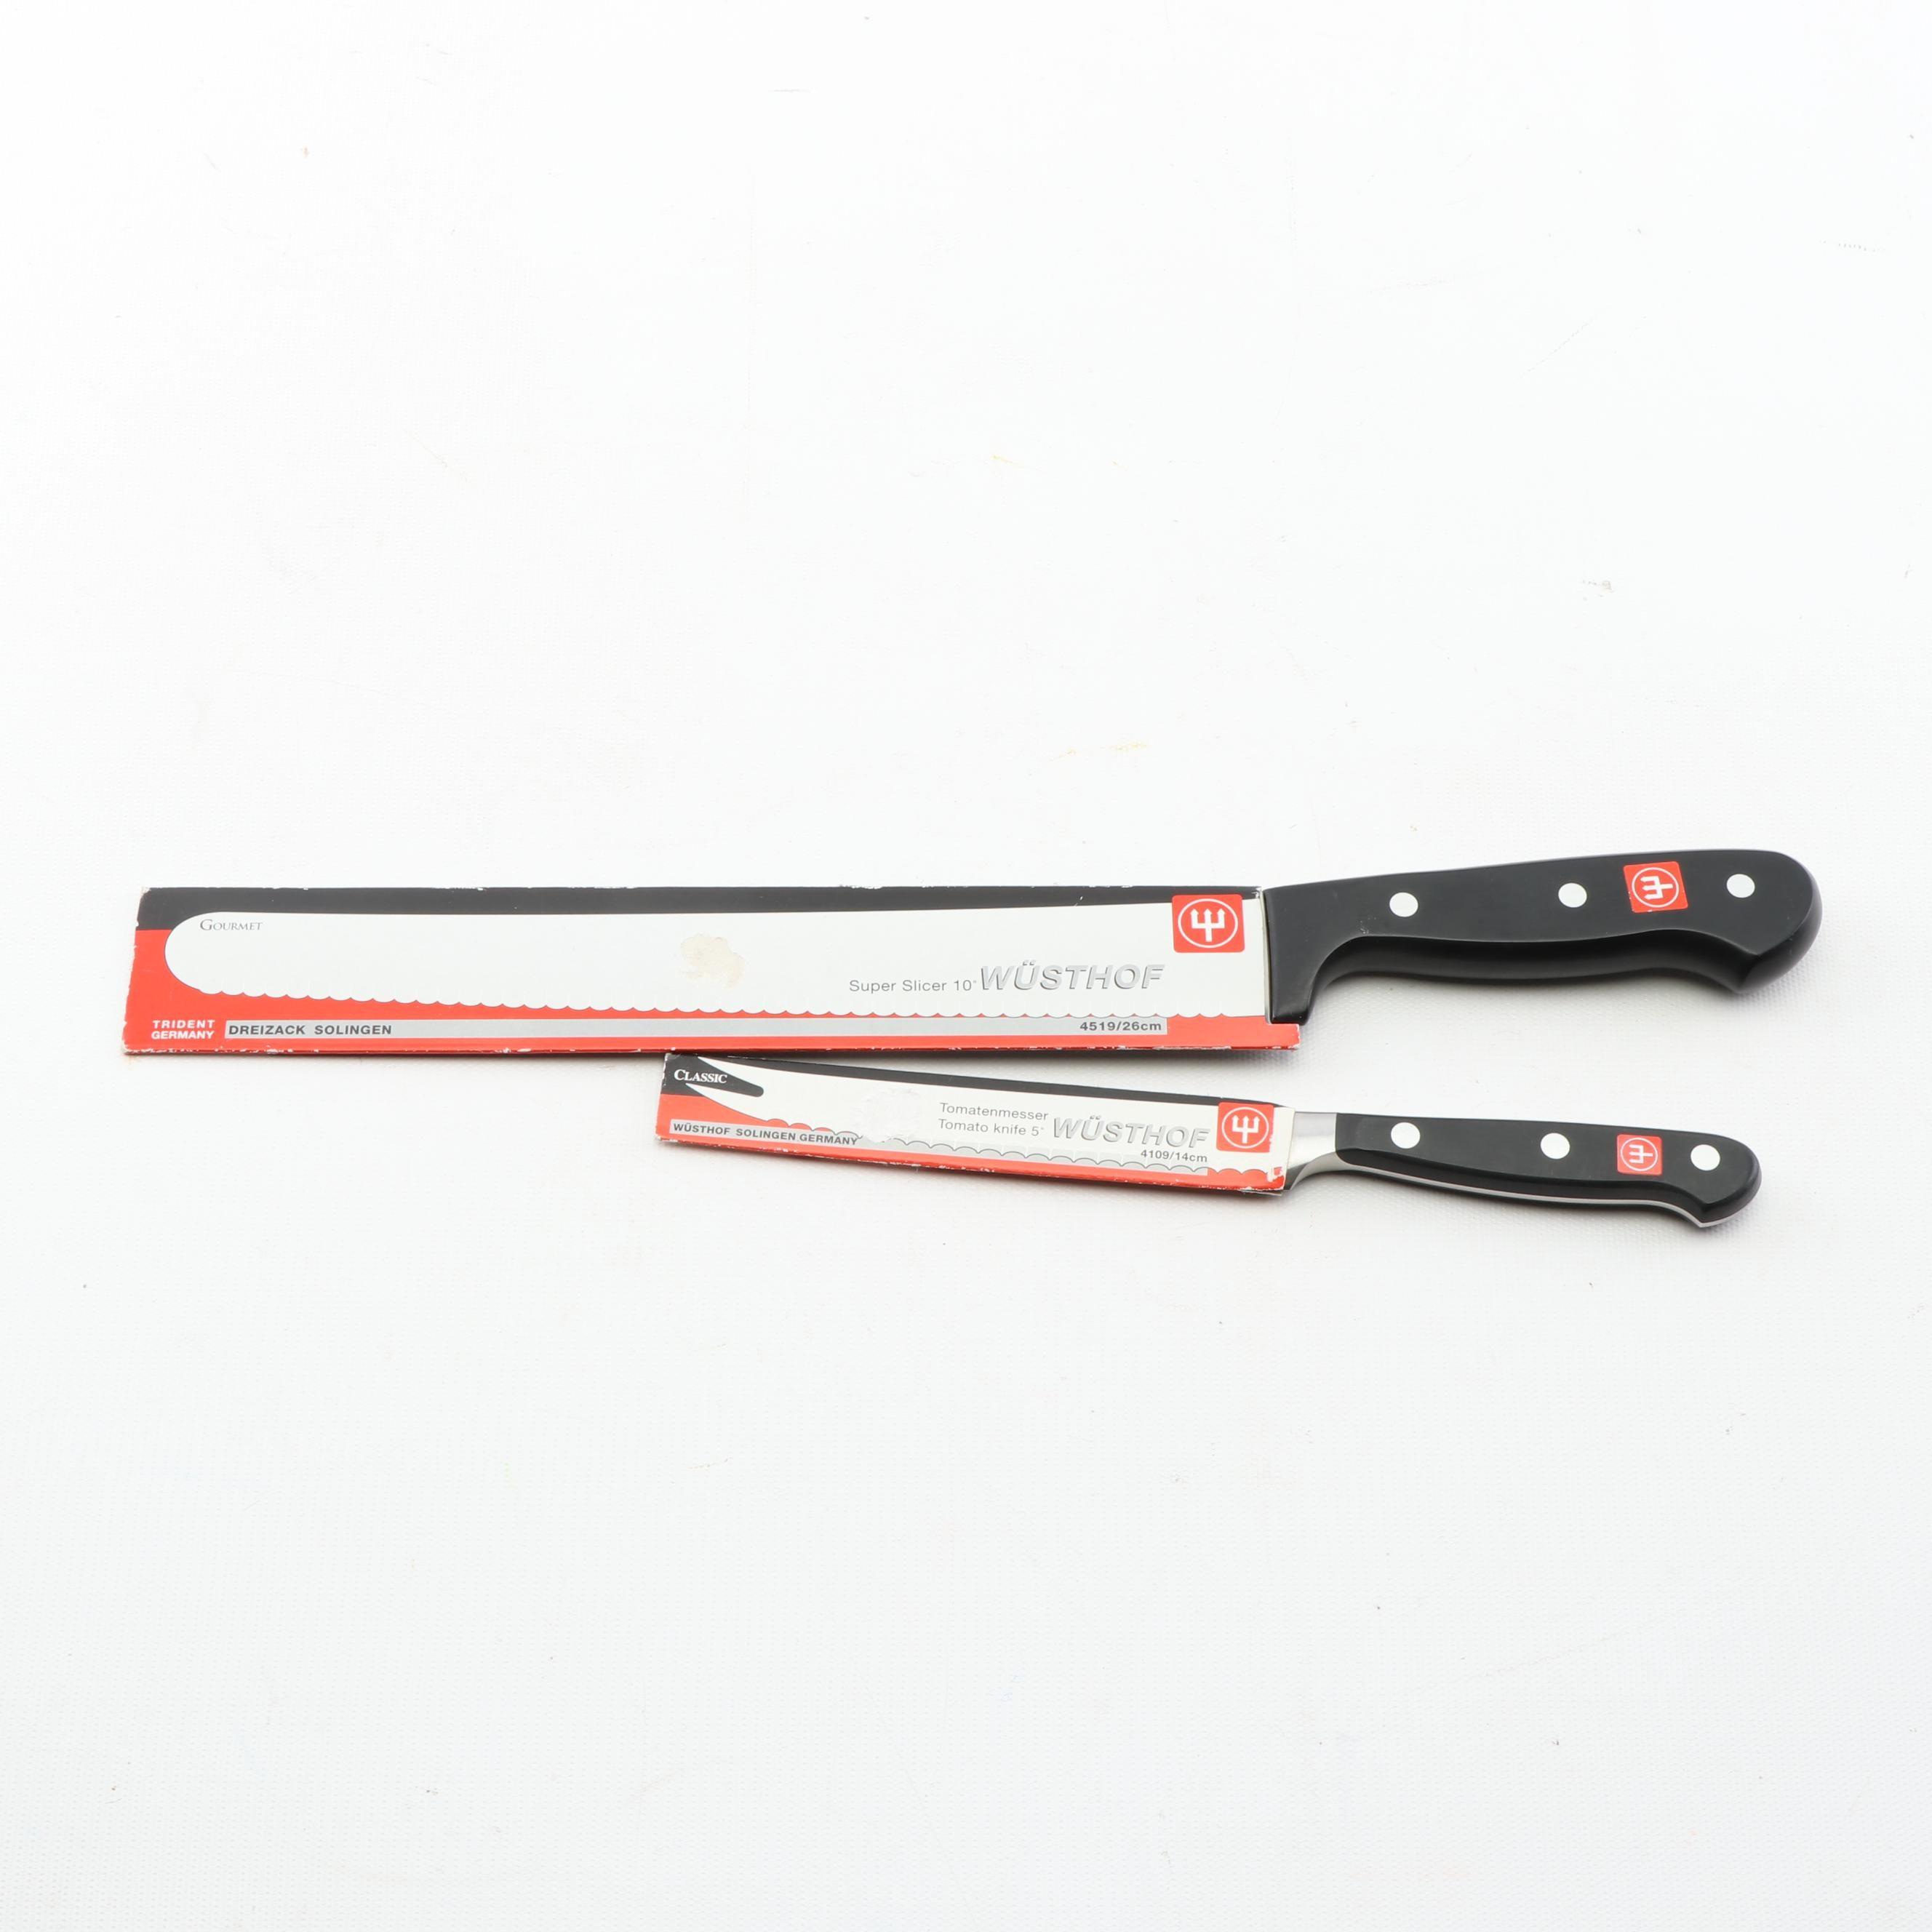 Wusthof Super Slicer and Tomato Knife